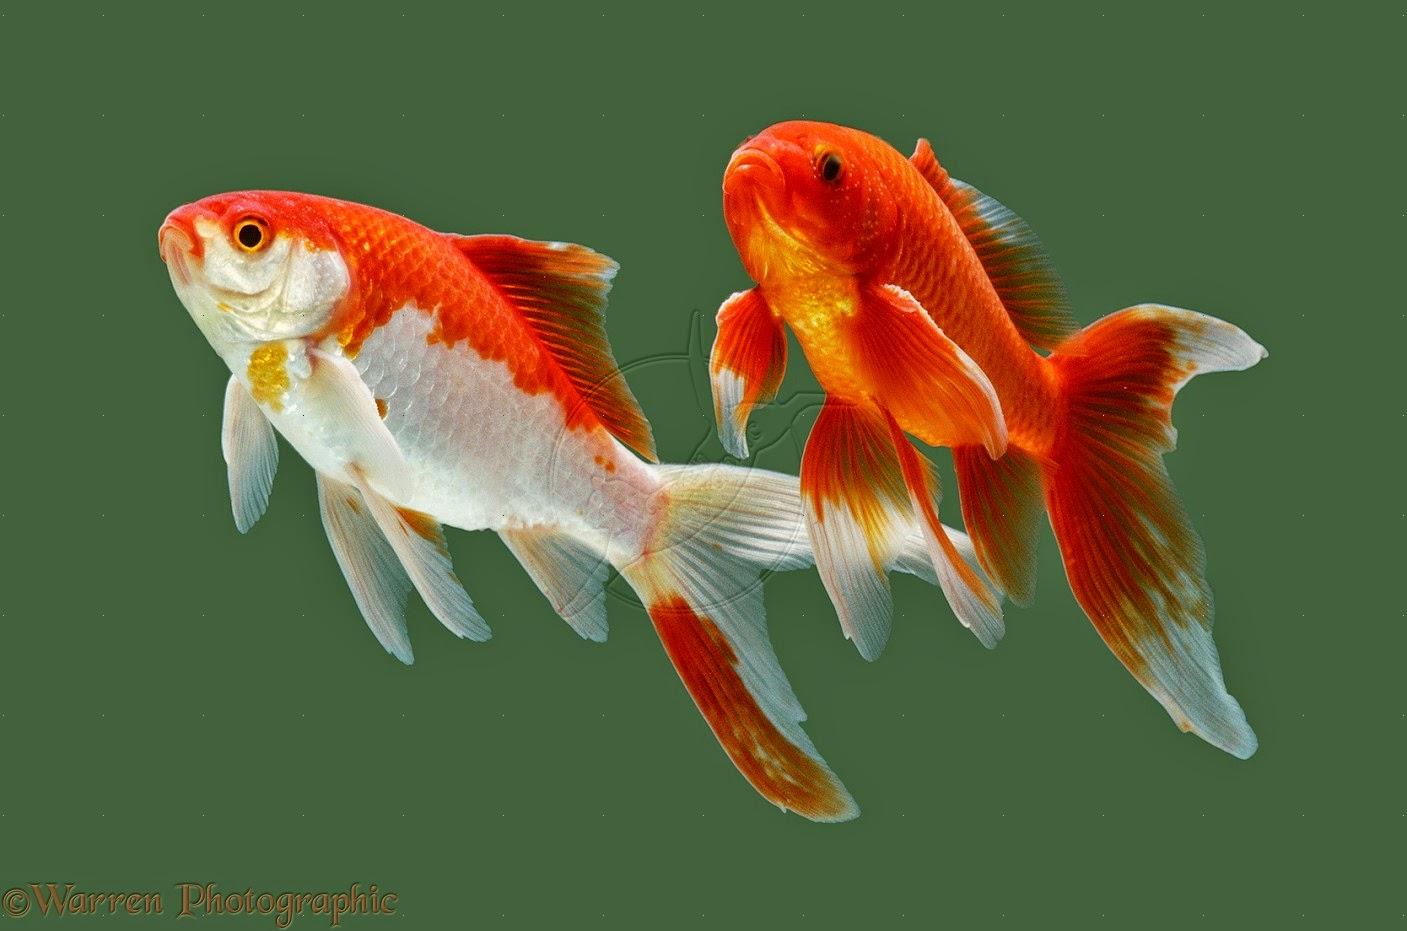 Thader tendencias mascotas el goldfish for Comida congelada para peces